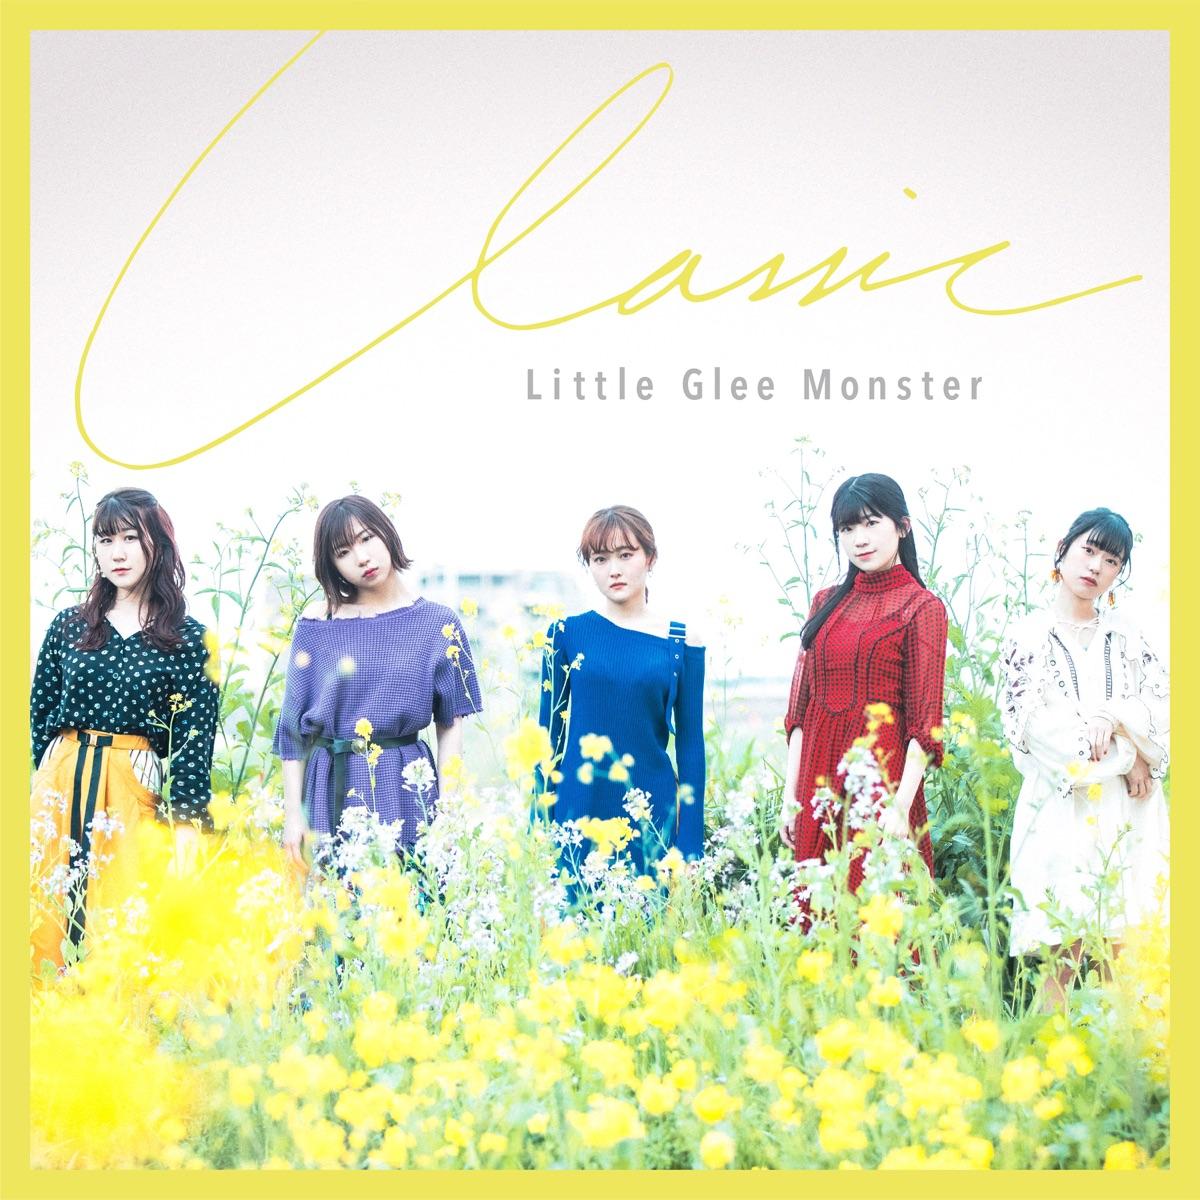 『Little Glee Monster - Classic』収録の『Classic』ジャケット